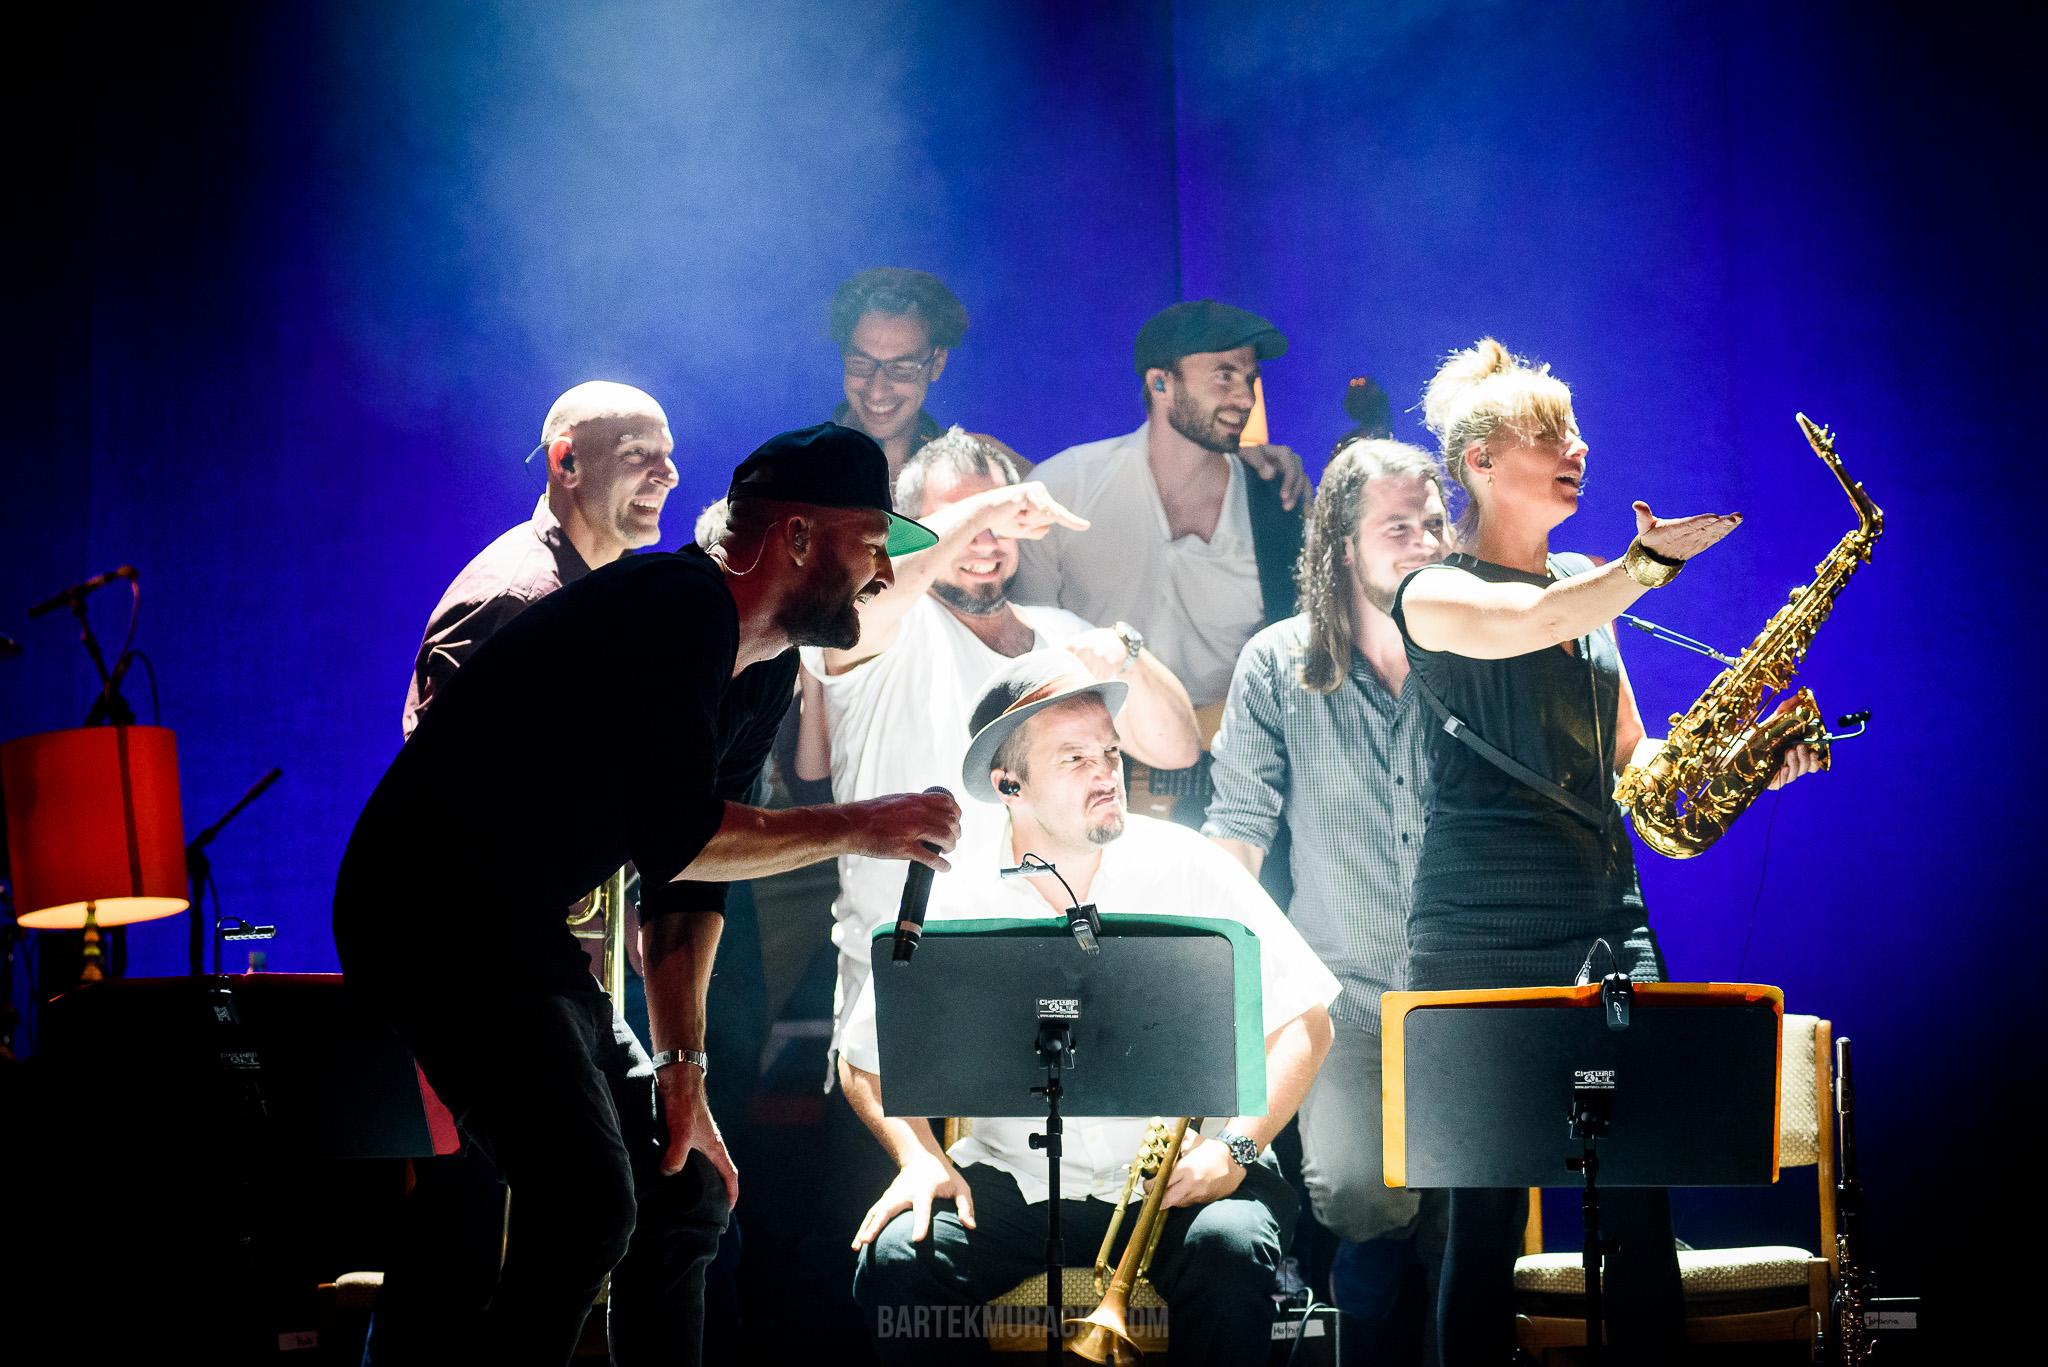 Gentleman-MTV-Unplugged-Spotkania-Kultur-fot-Bartek-Muracki-18-2084